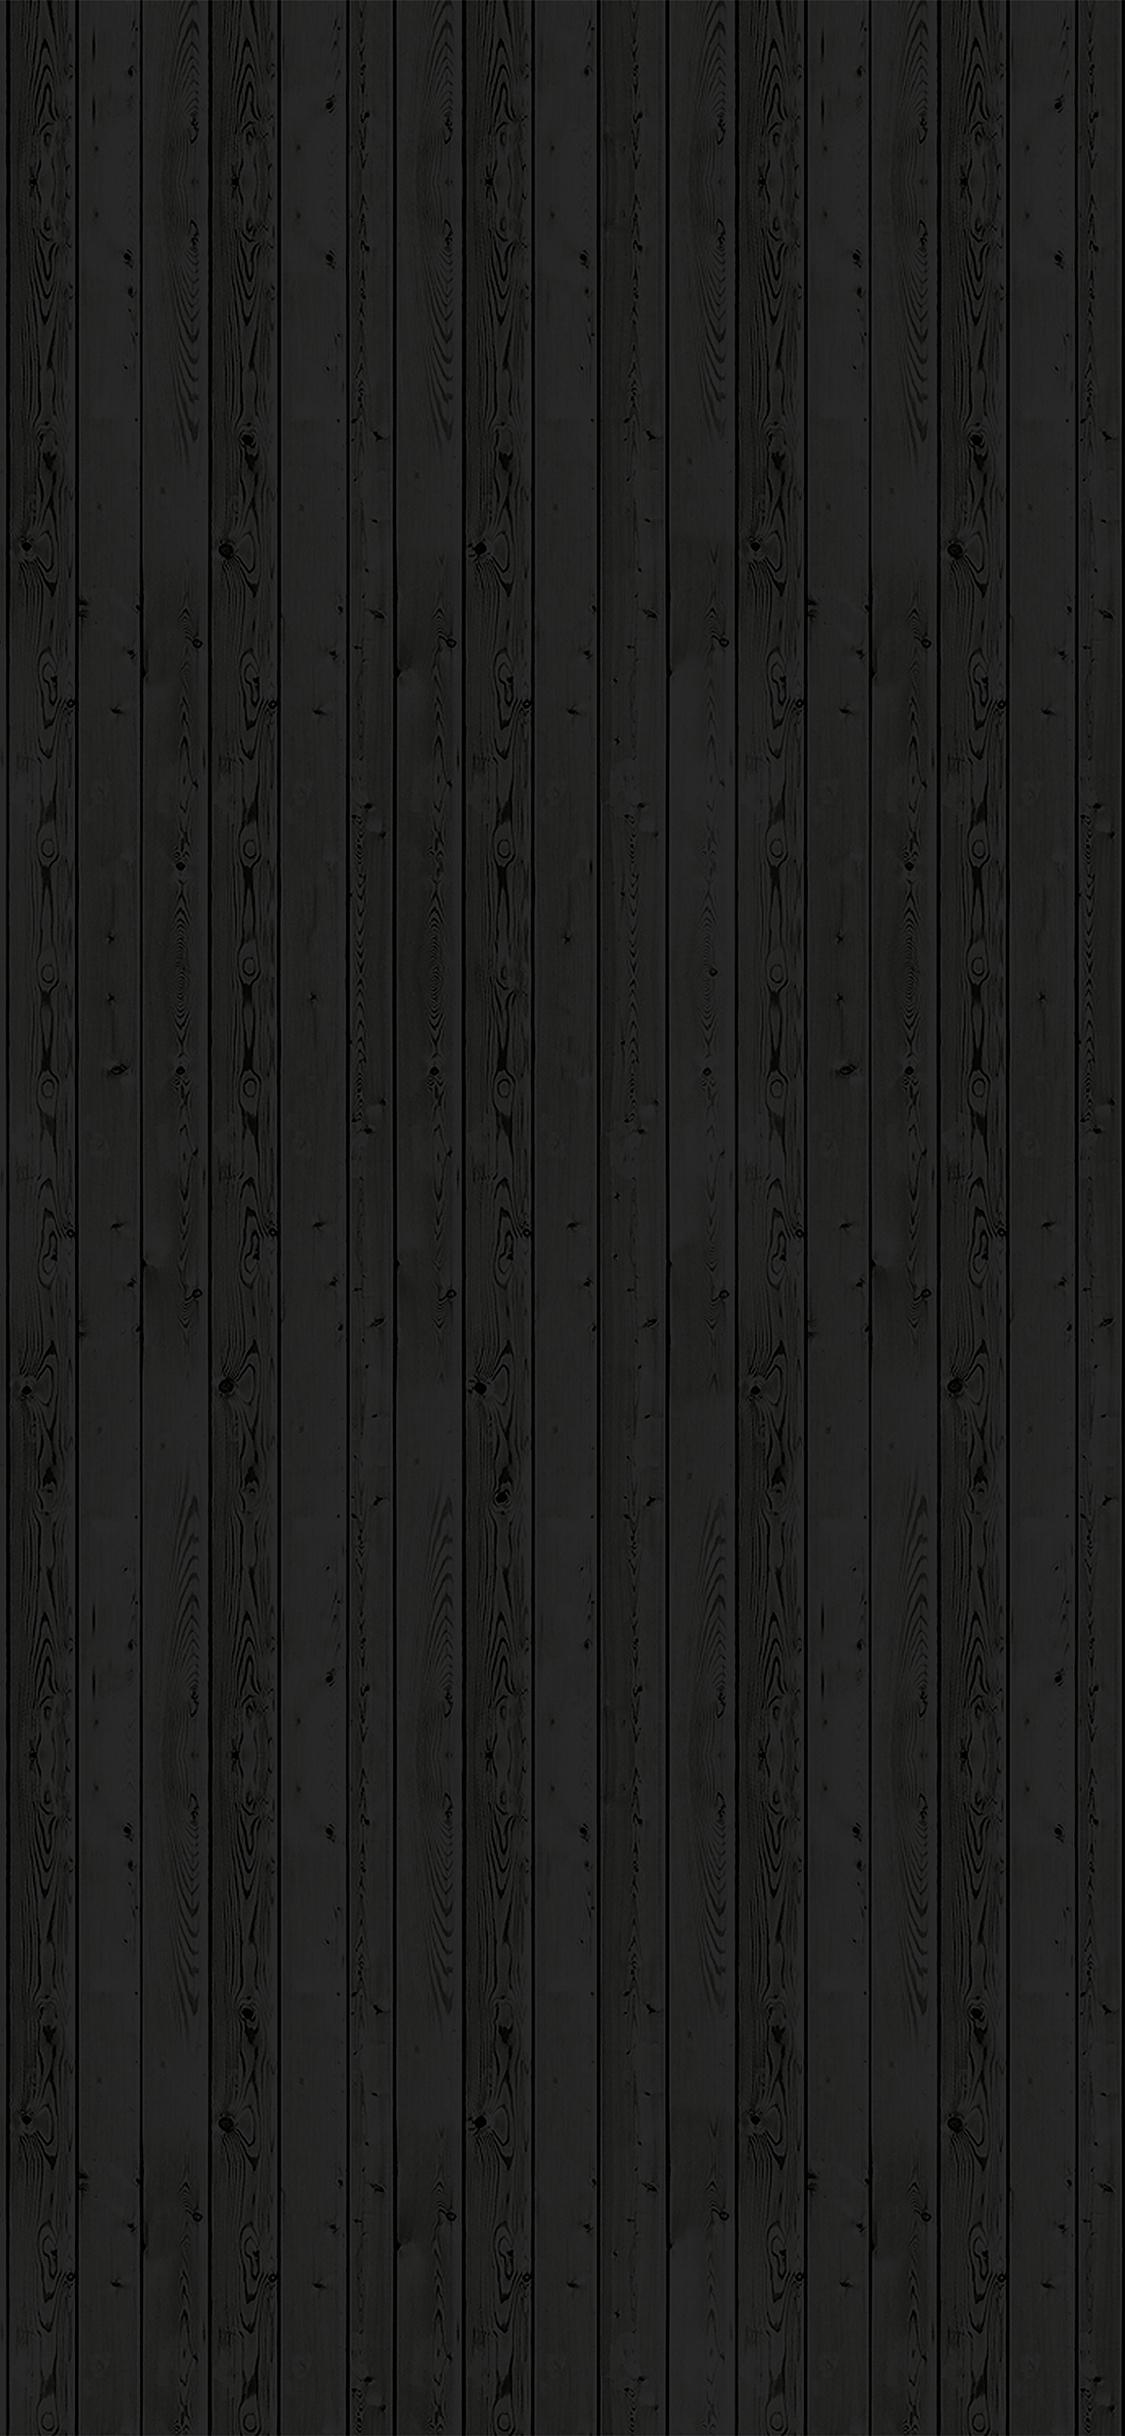 iPhoneXpapers.com-Apple-iPhone-wallpaper-vd50-wooden-floor-pattern-natural-dark